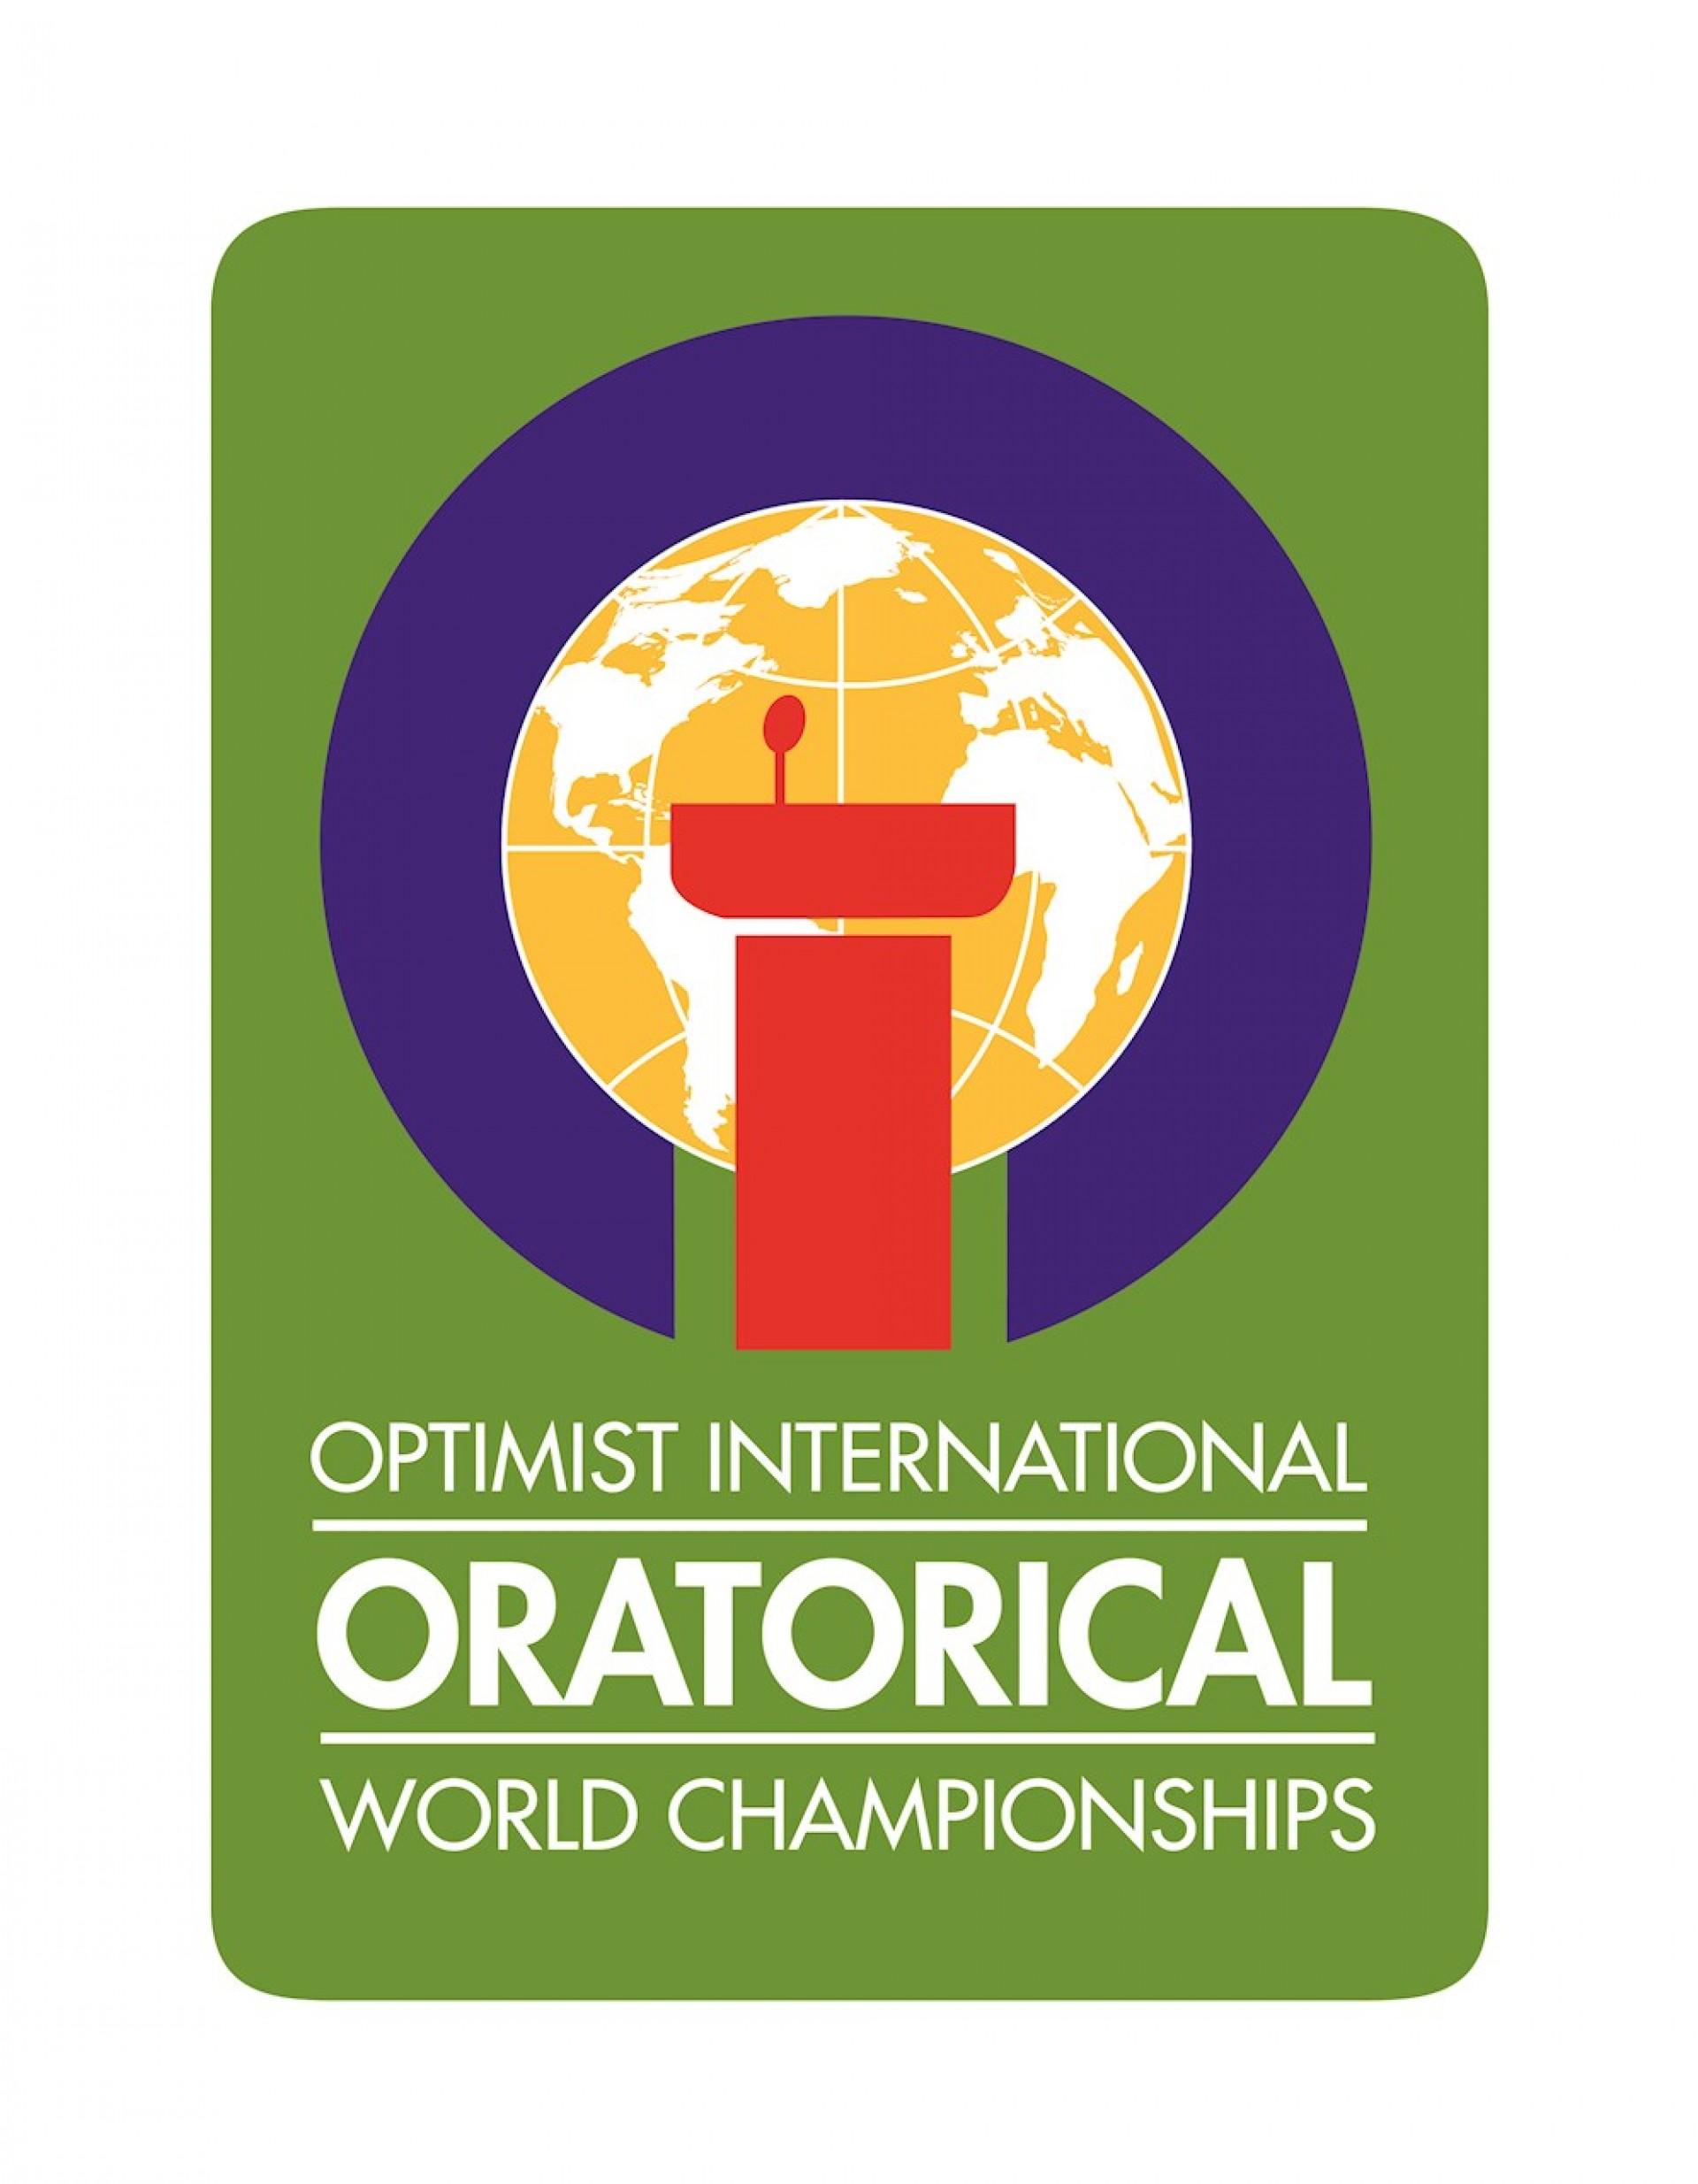 006 Optimist International Essay Contest Example Oratorical High Wondrous Winners Due Date 1920